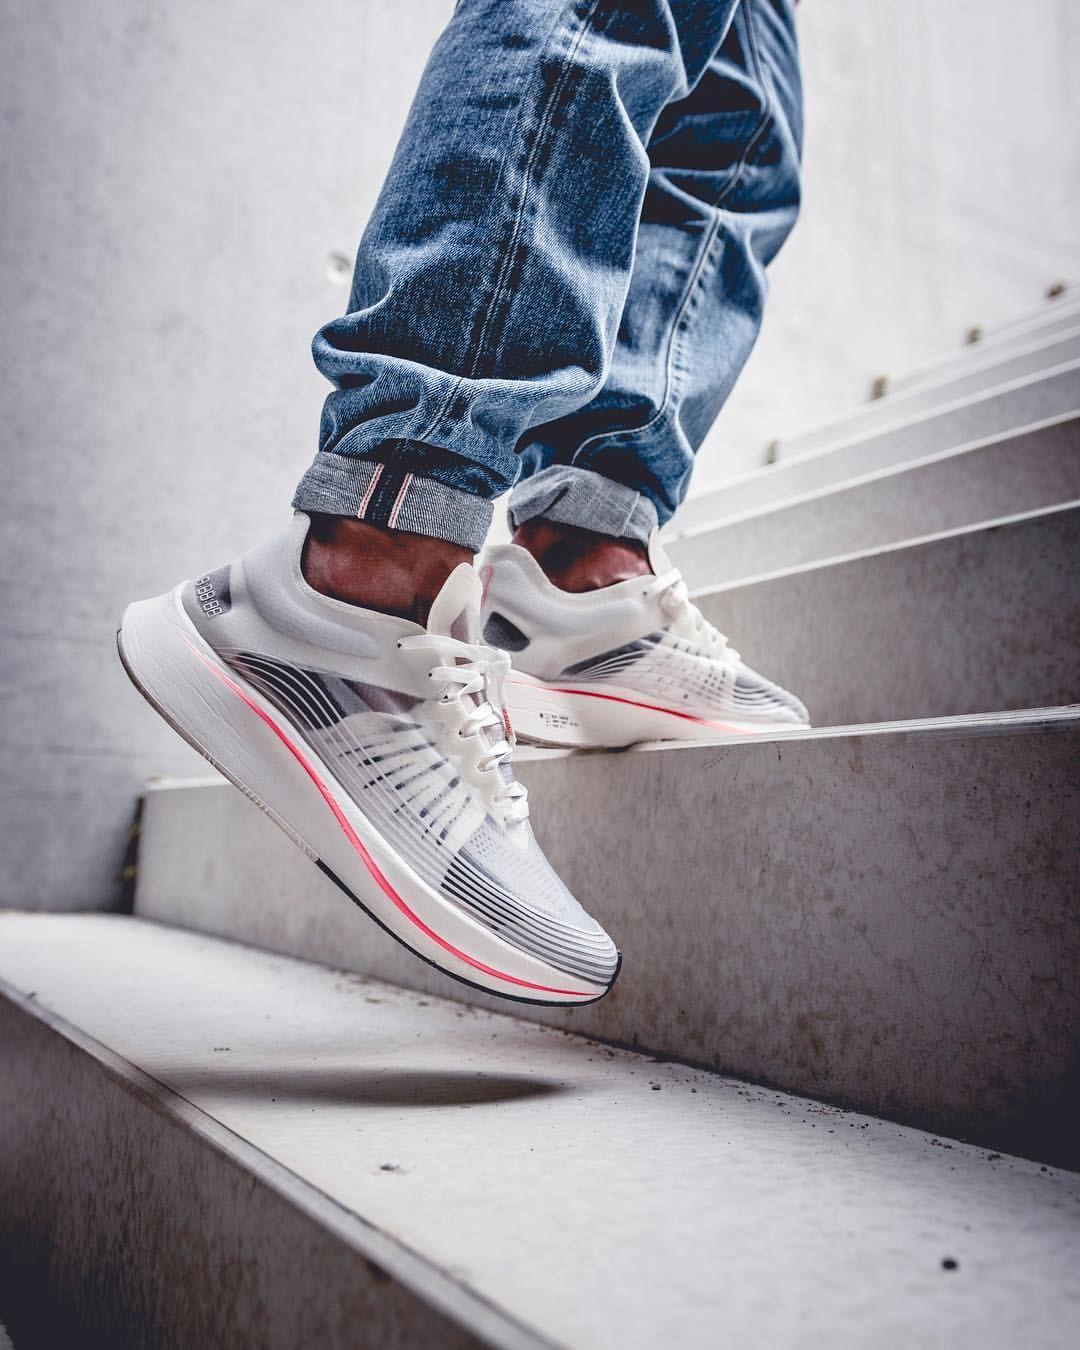 Nike Zoom Fly SP | Nike zoom, Nike, Comfy nikes